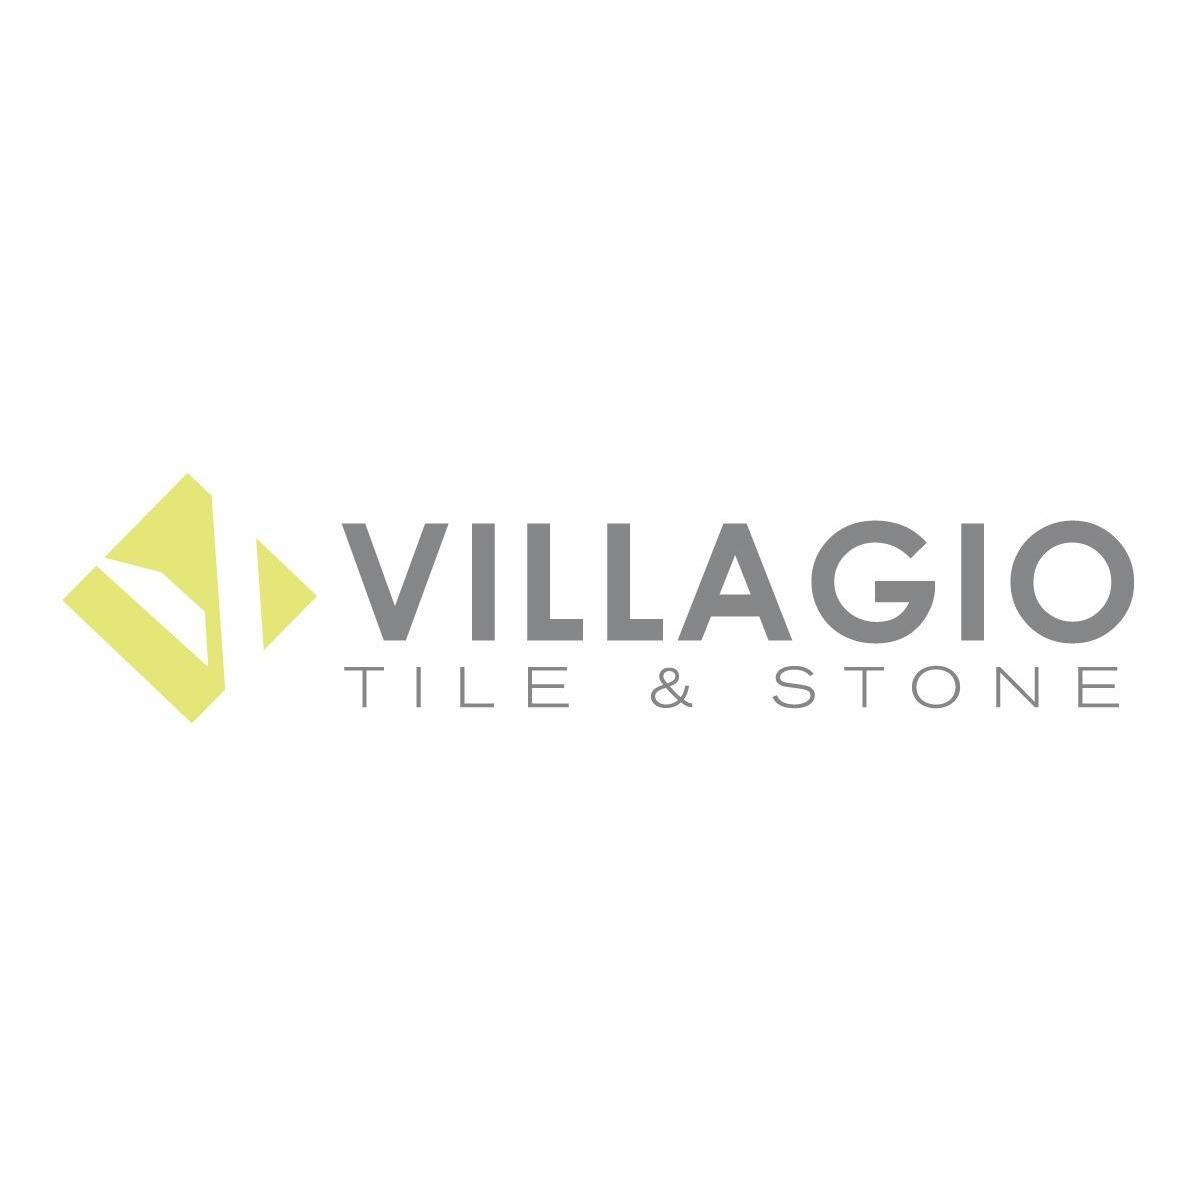 Villagio Tile Amp Stone Scottsdale Arizona Az